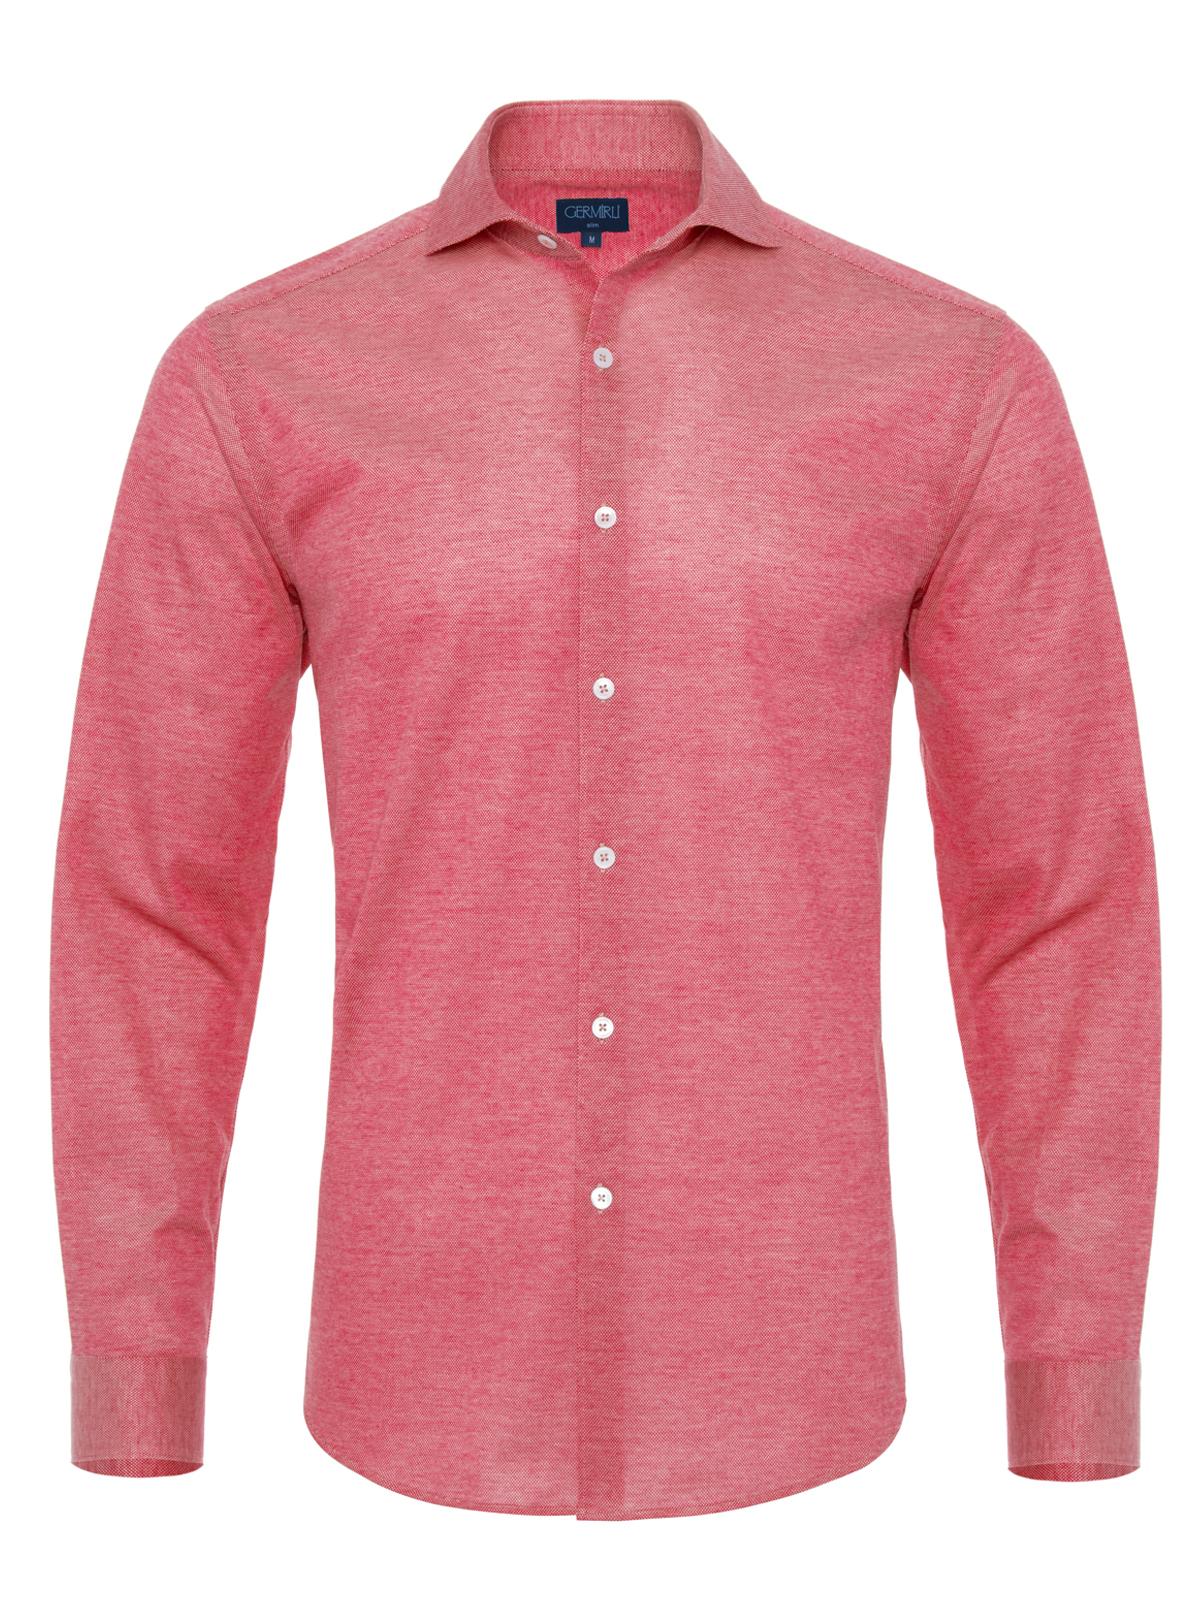 Germirli - Germirli Coral Red Soft Collar Jersey Slim Fit Shirt